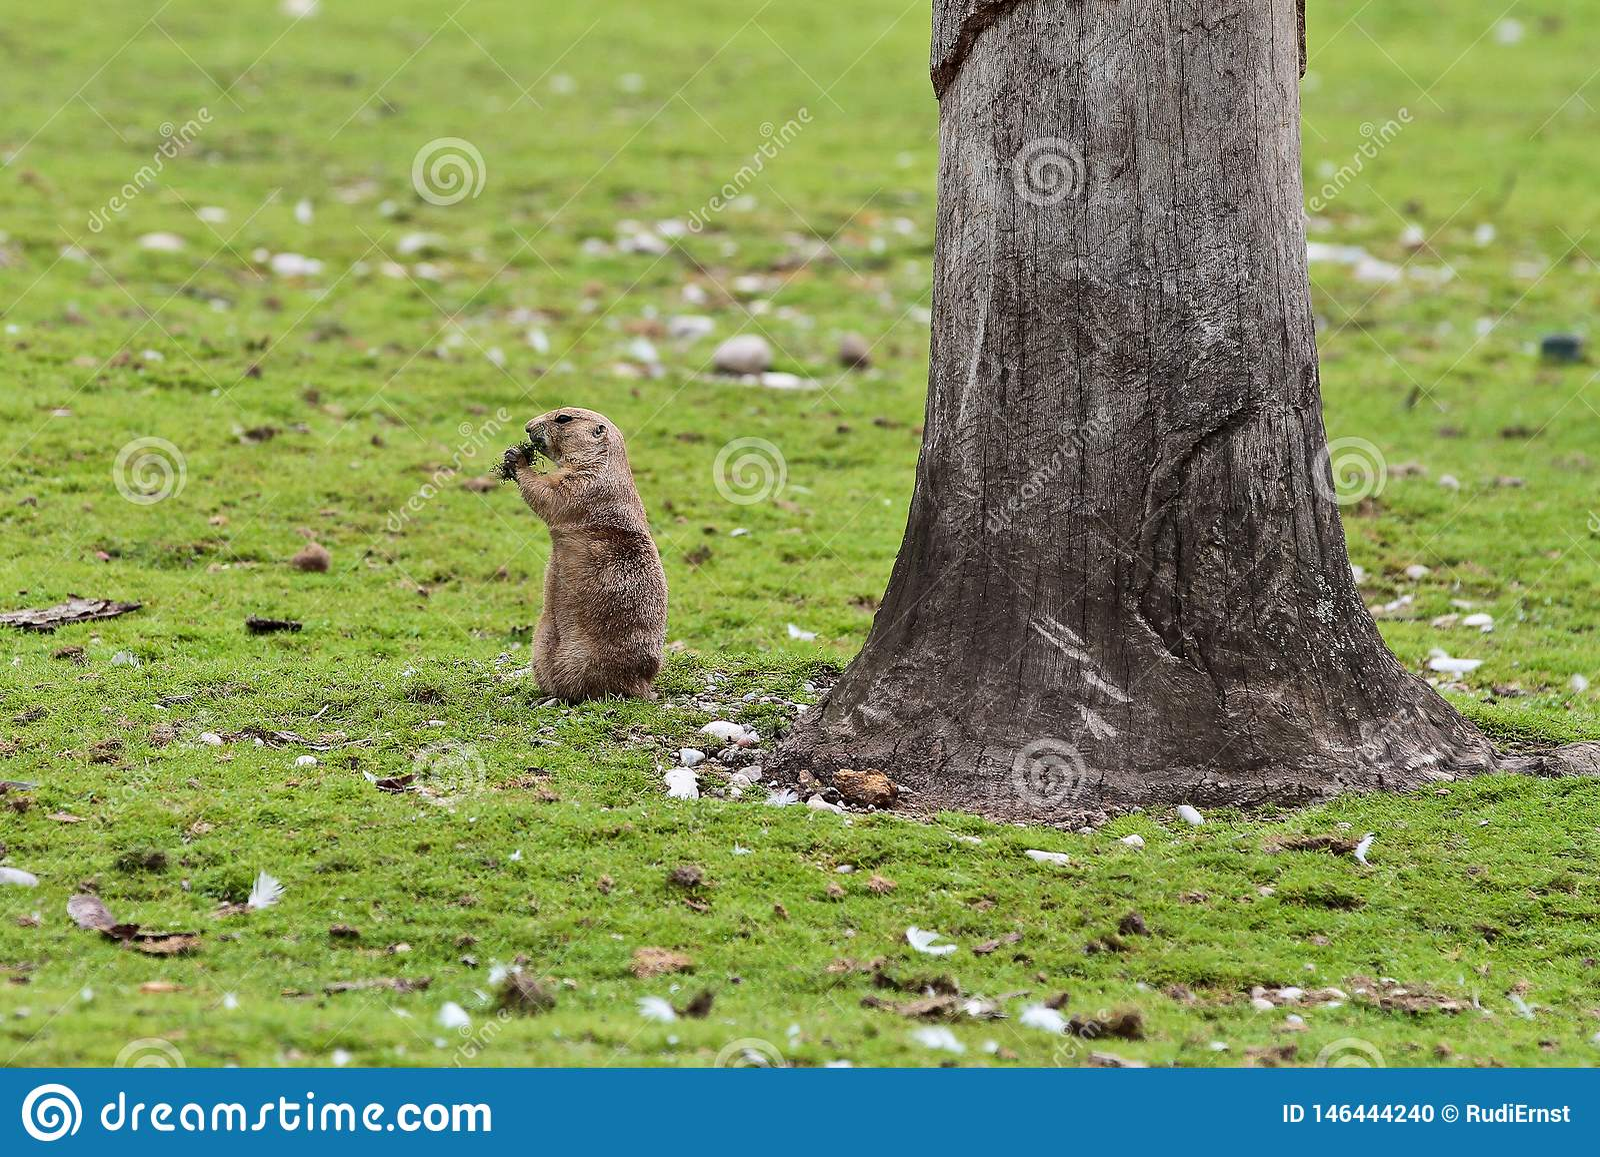 Alpine marmot, marmota marmota, in the zoo